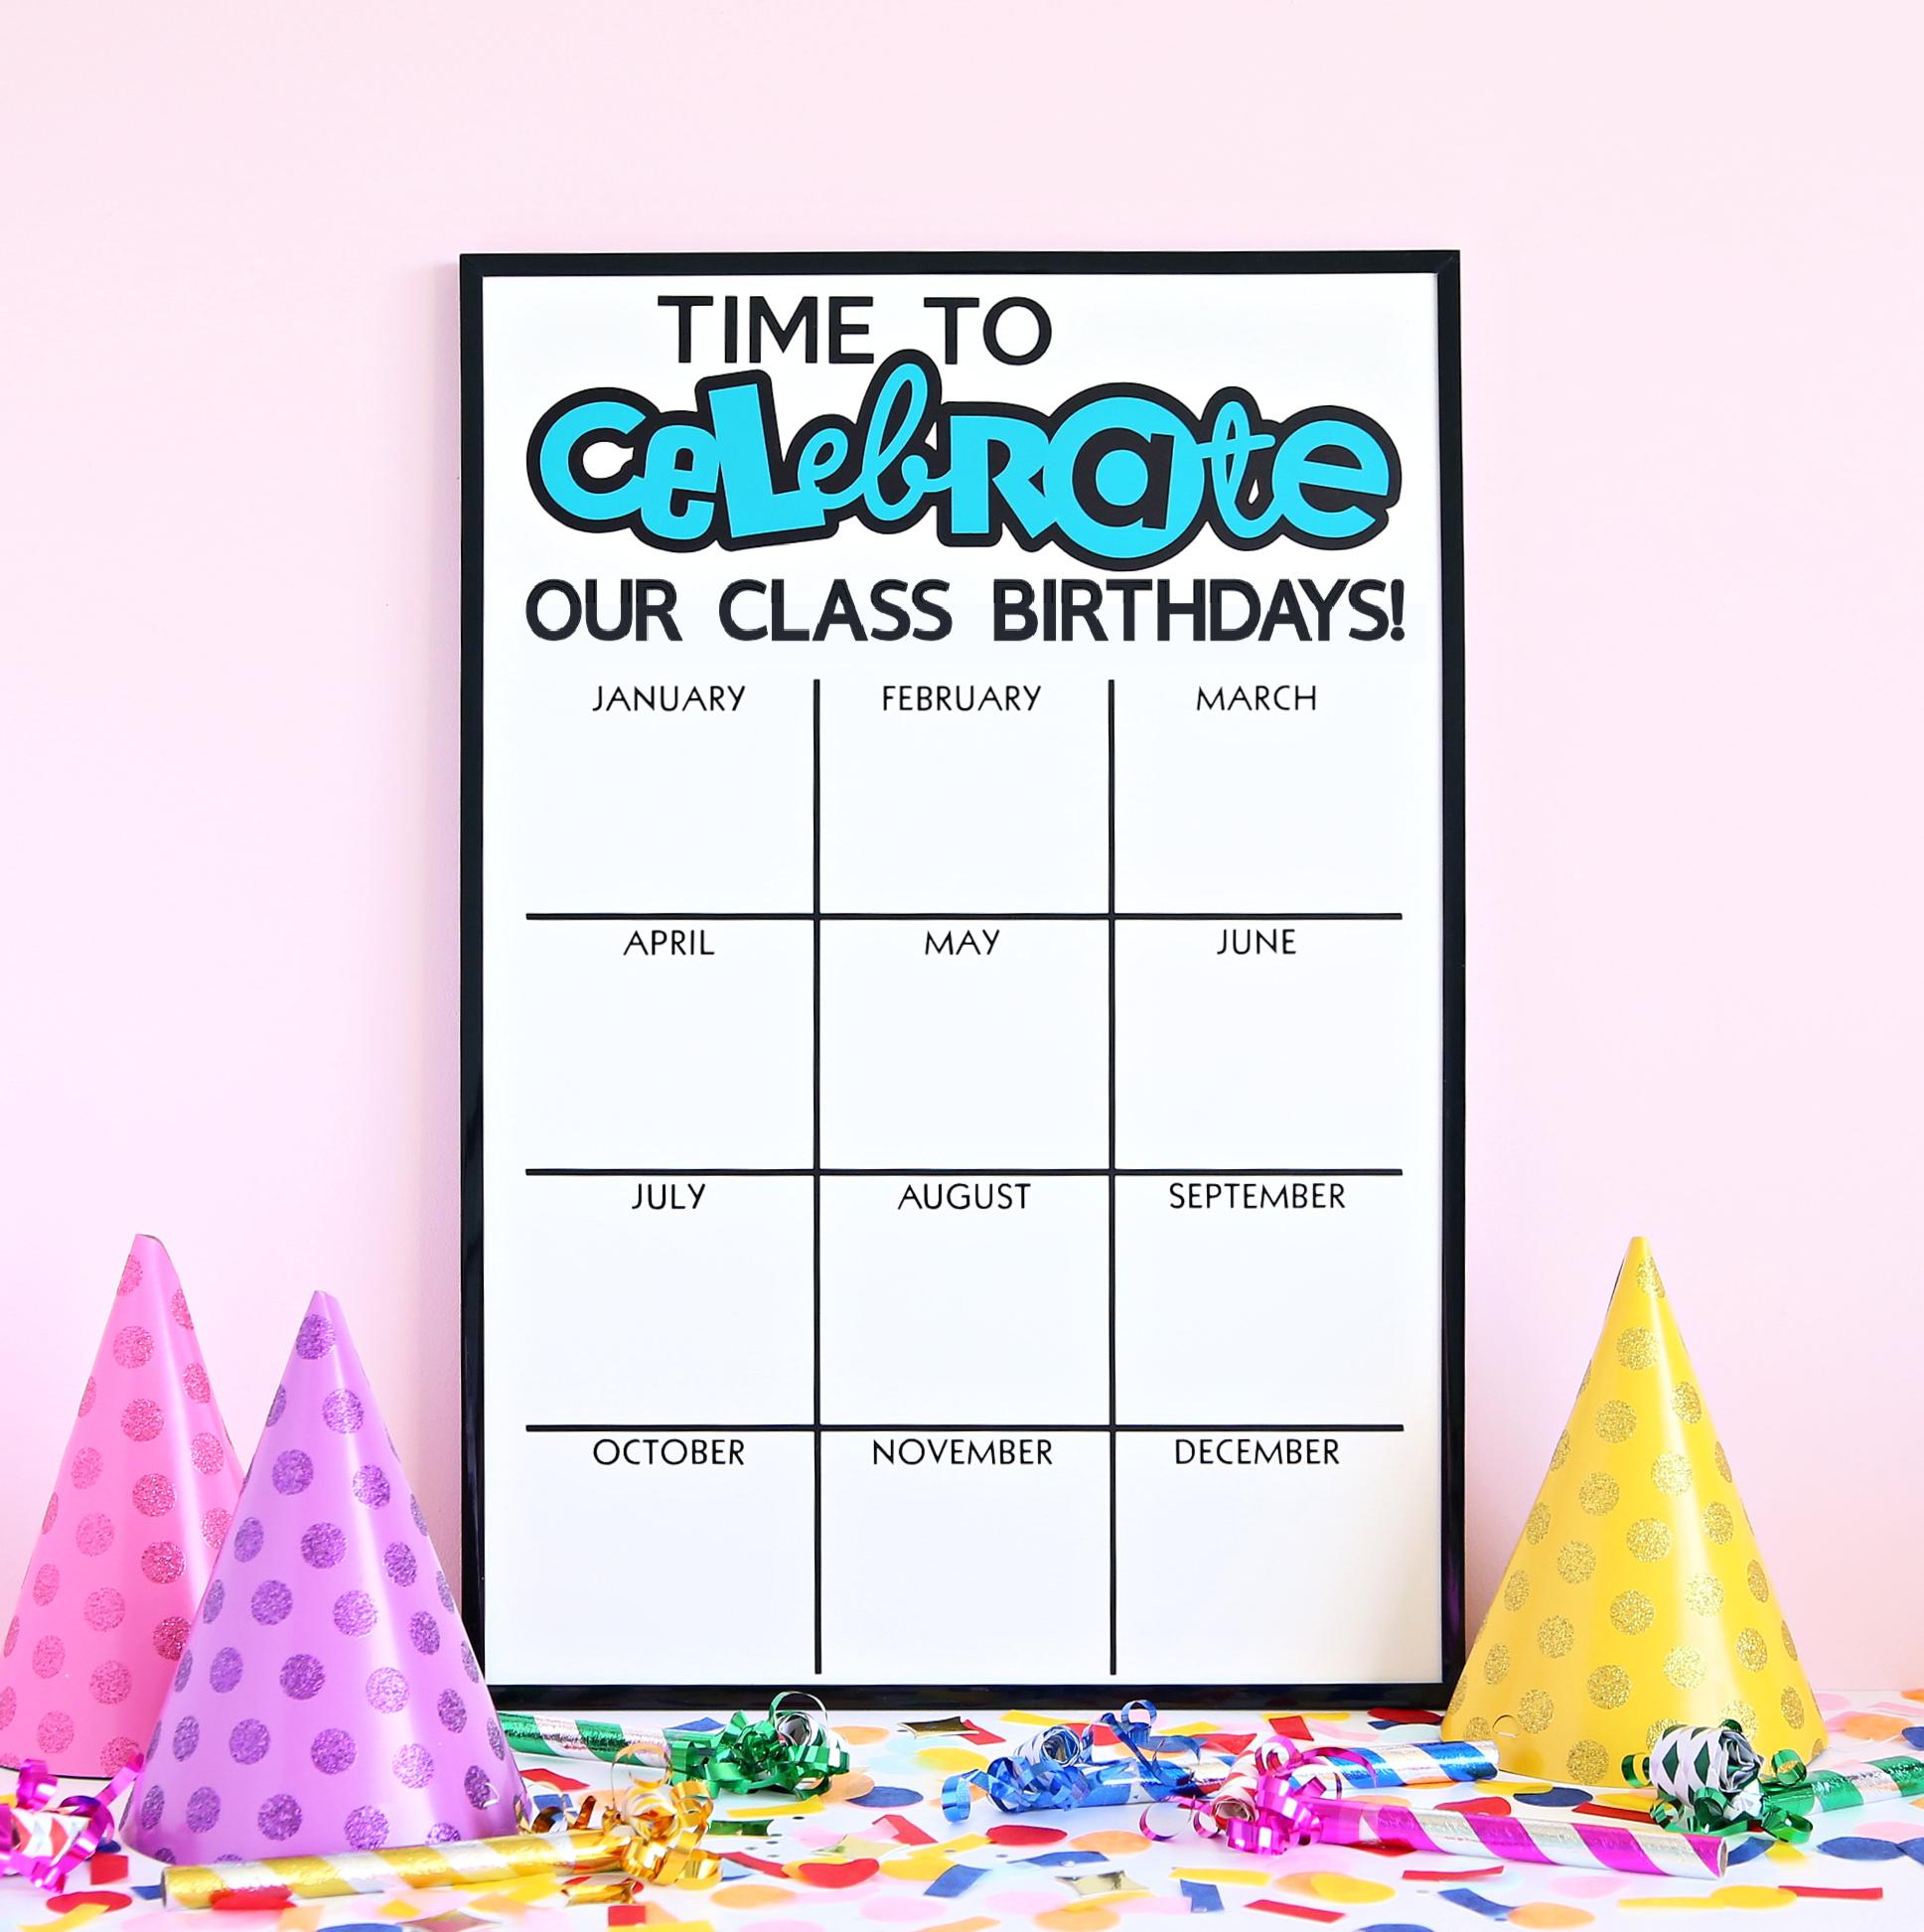 Classroom Birthday Dry Erase Board